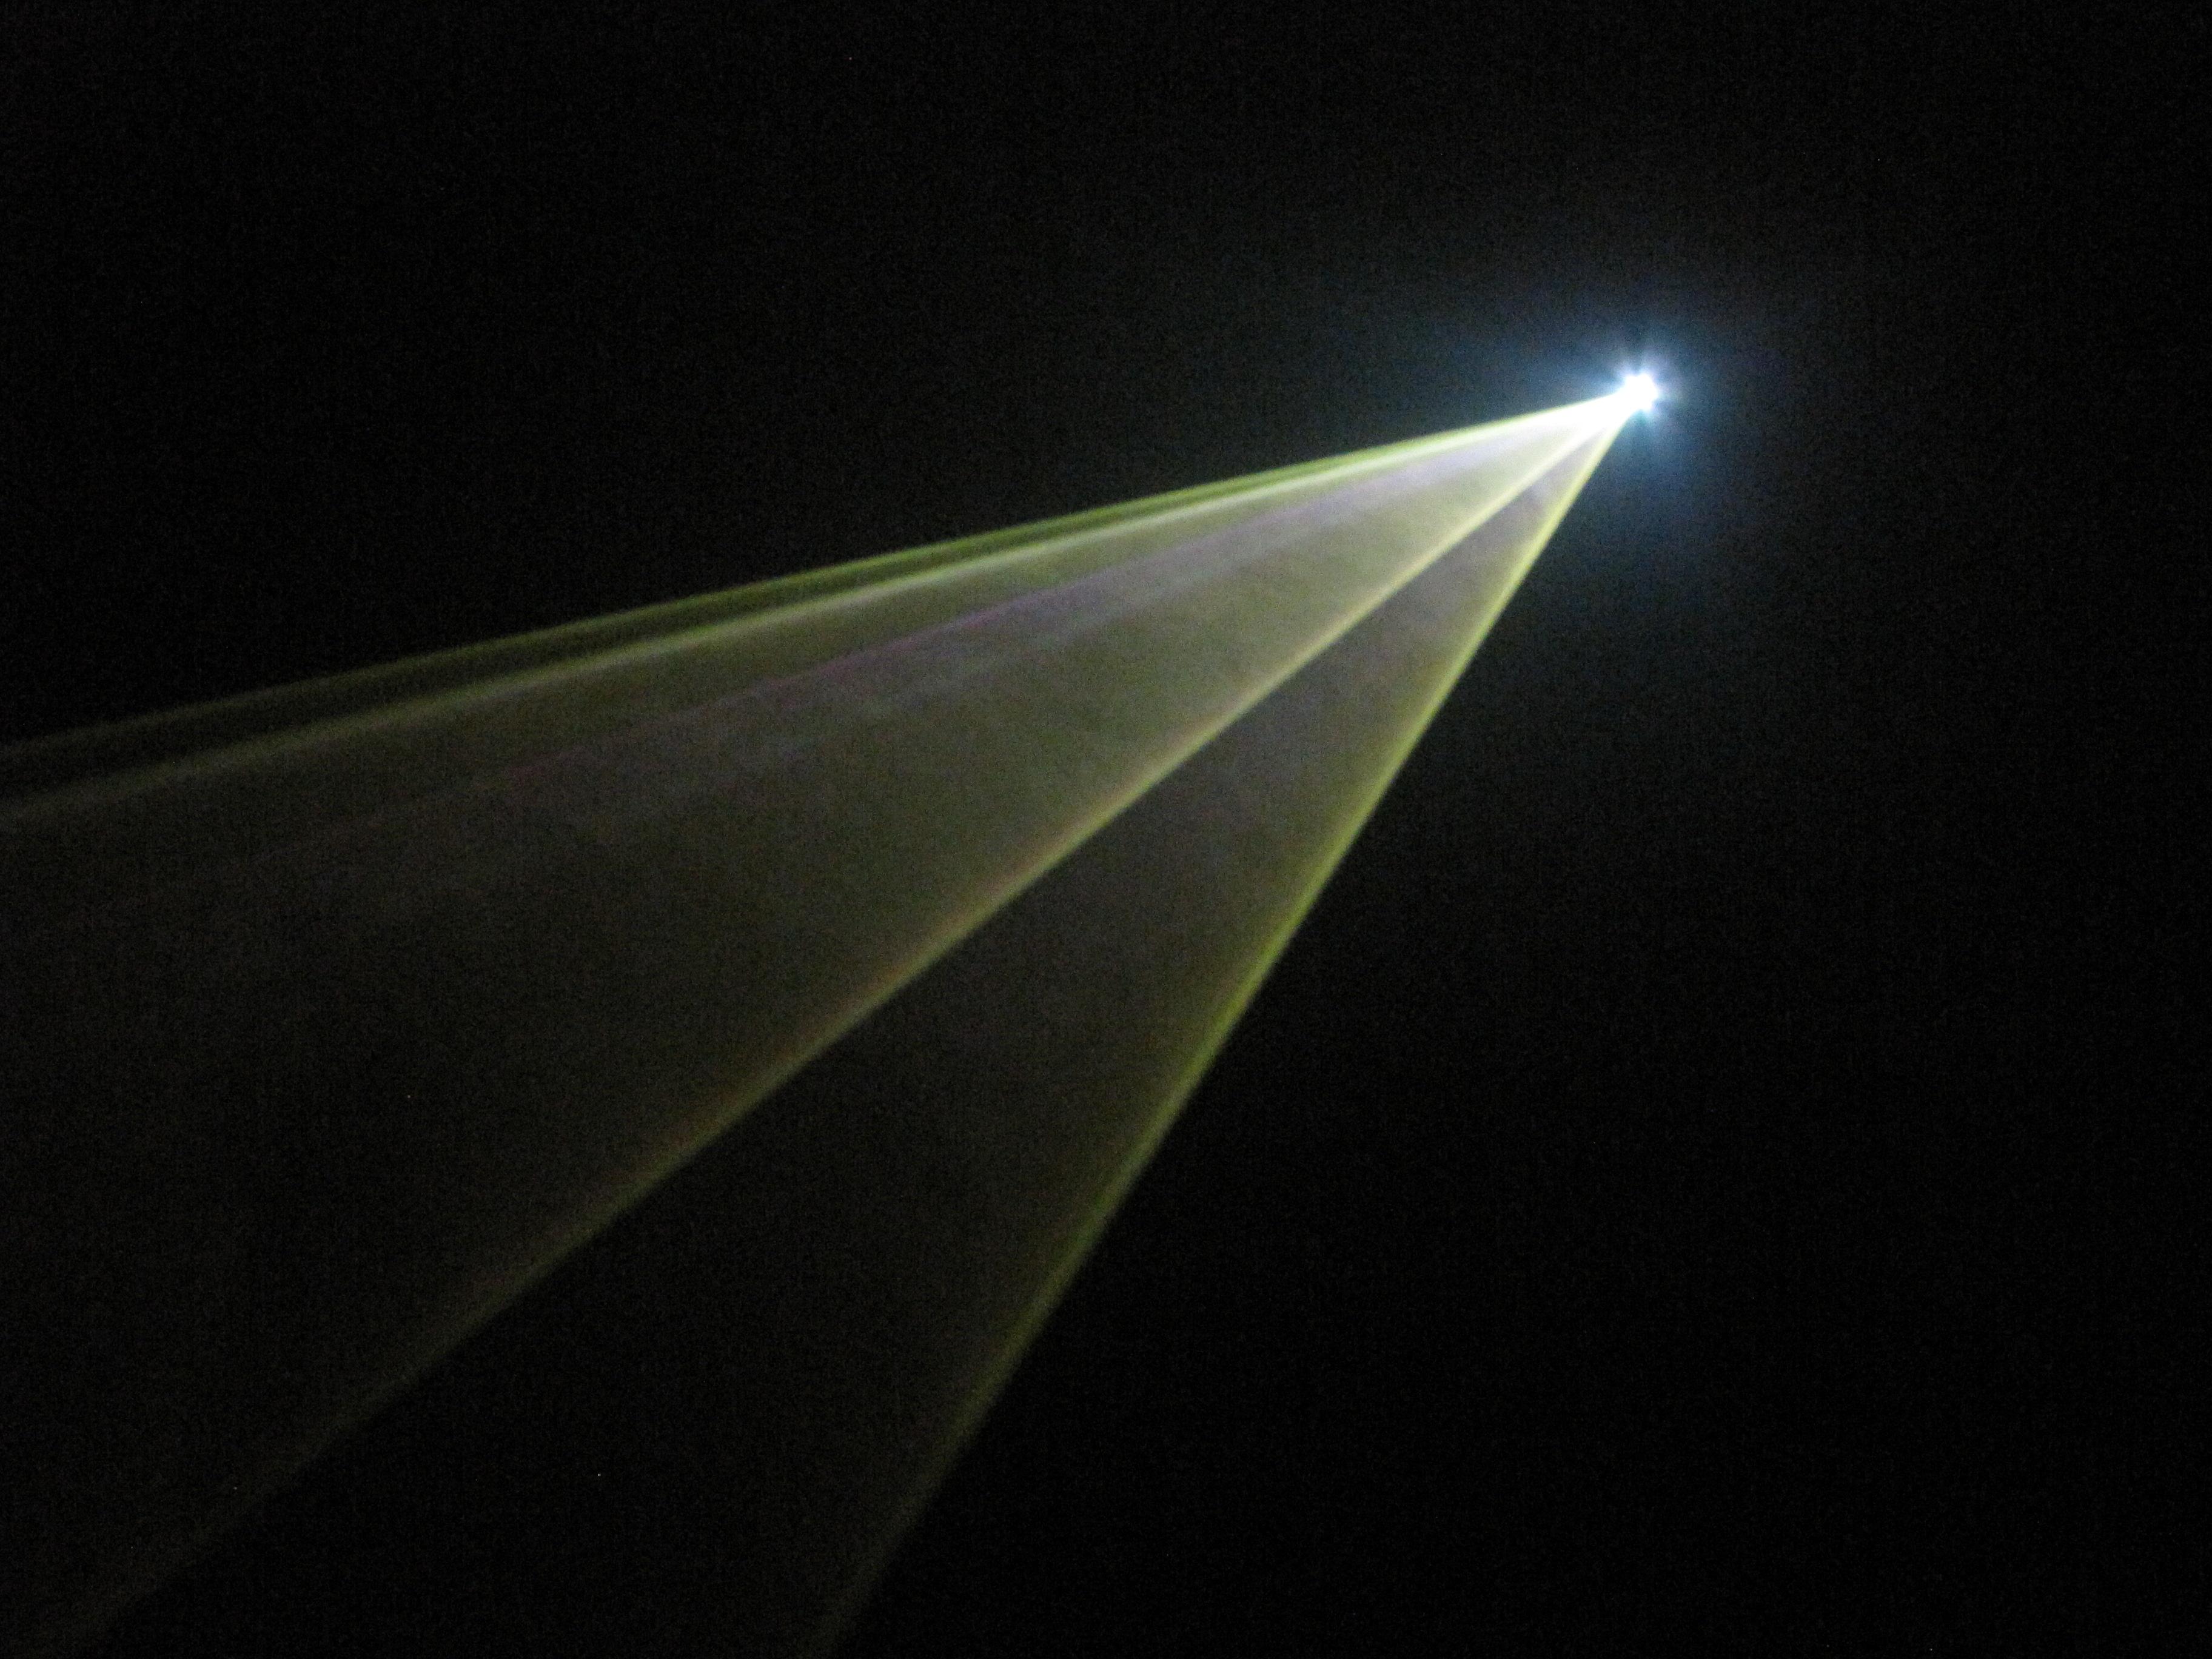 photo essay experiencing the ldquo horizon light rdquo uw college of arts star wars